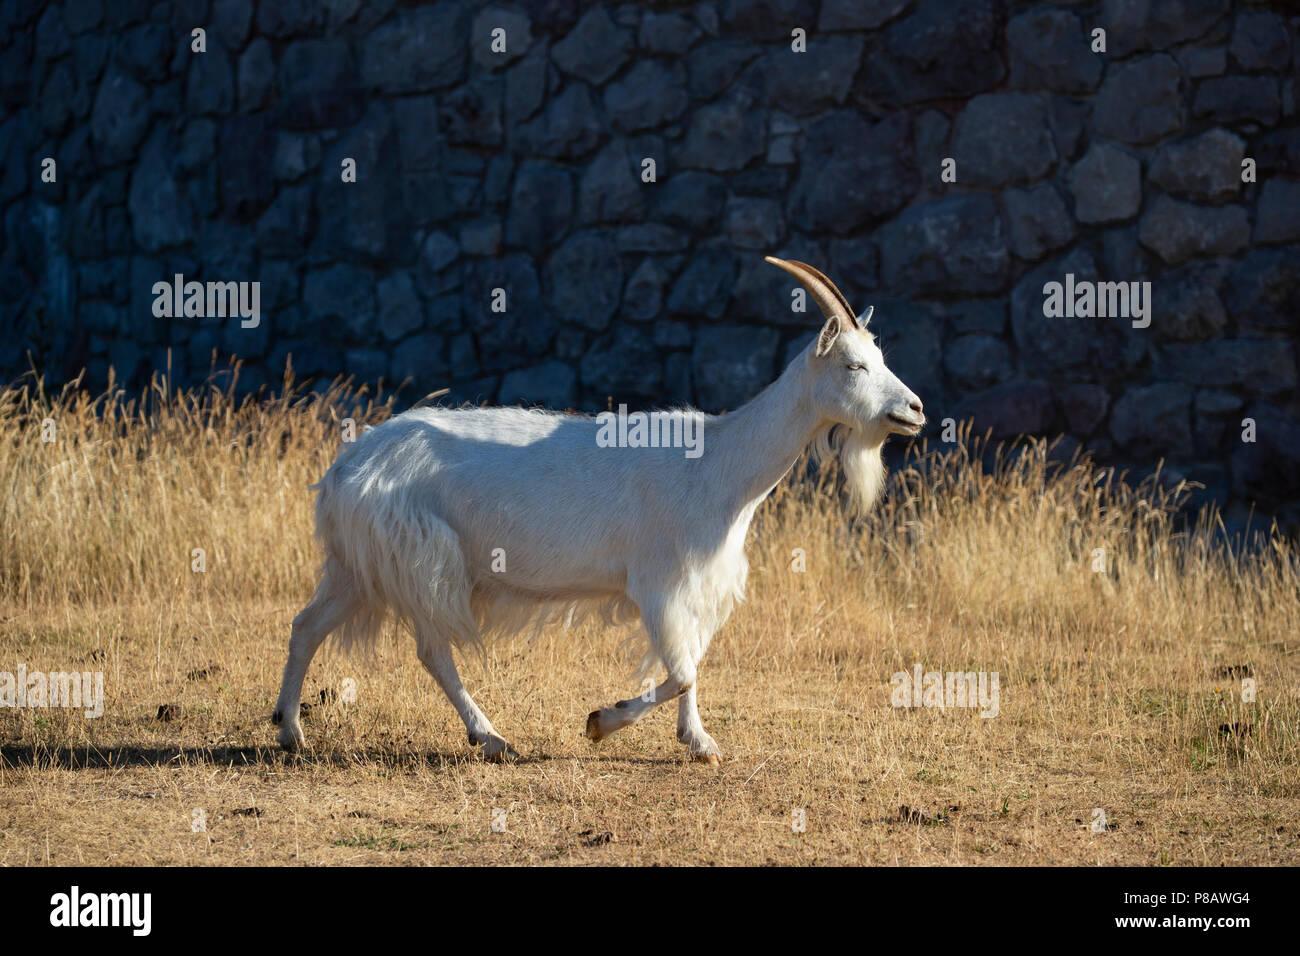 One Kashmiri goat Capra Markhor walking near the summit of the Great Orme headland in Llandudno. North Wales - Stock Image